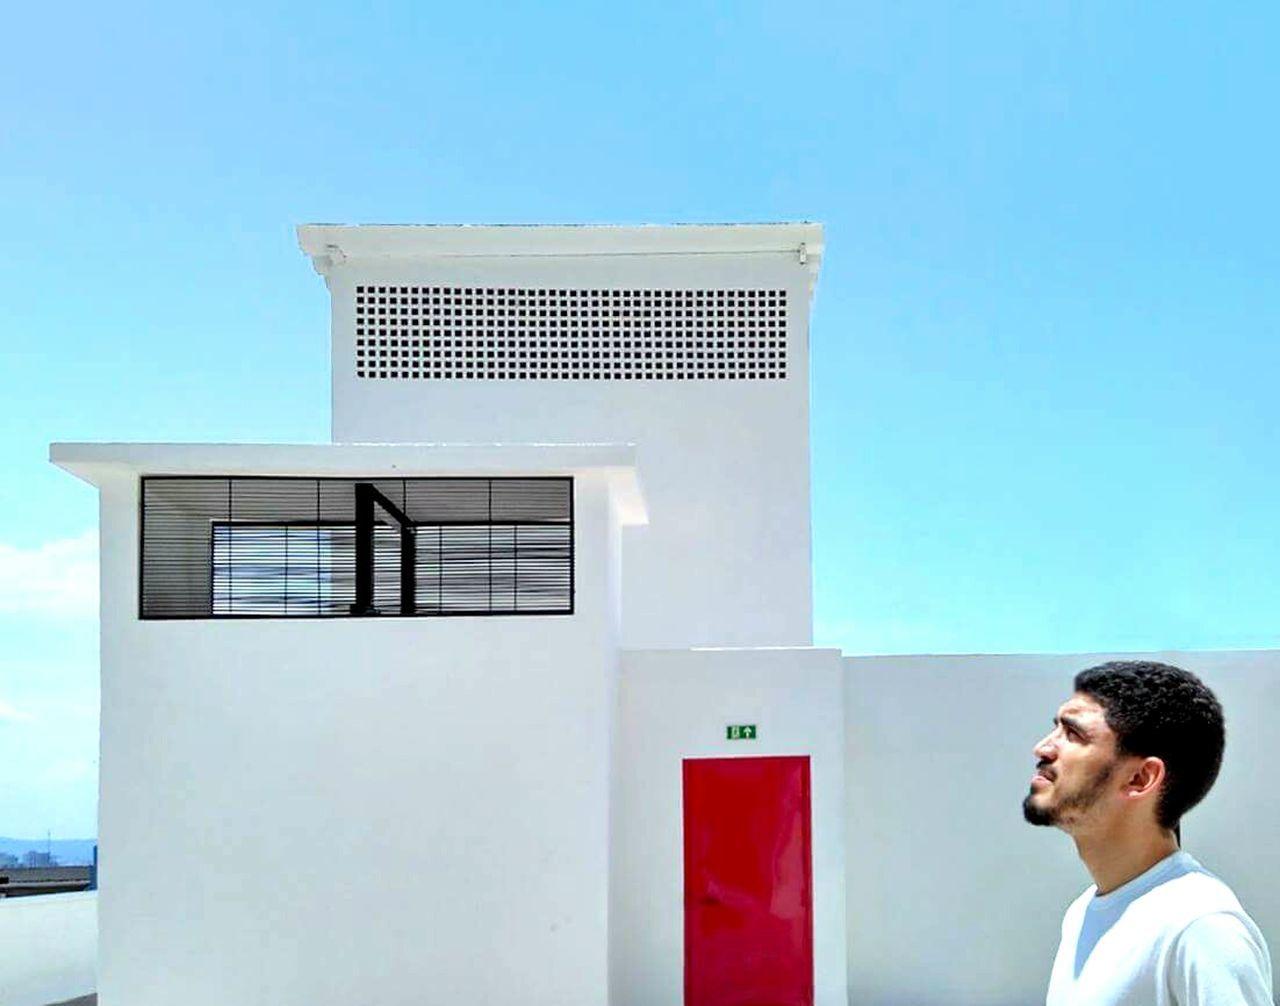 Reddoor Whitewalls  Architecturelovers Architecturephotography Architectureporn Minimalmood Minimalistic Details Sao Paulo - Brazil Architecture Details